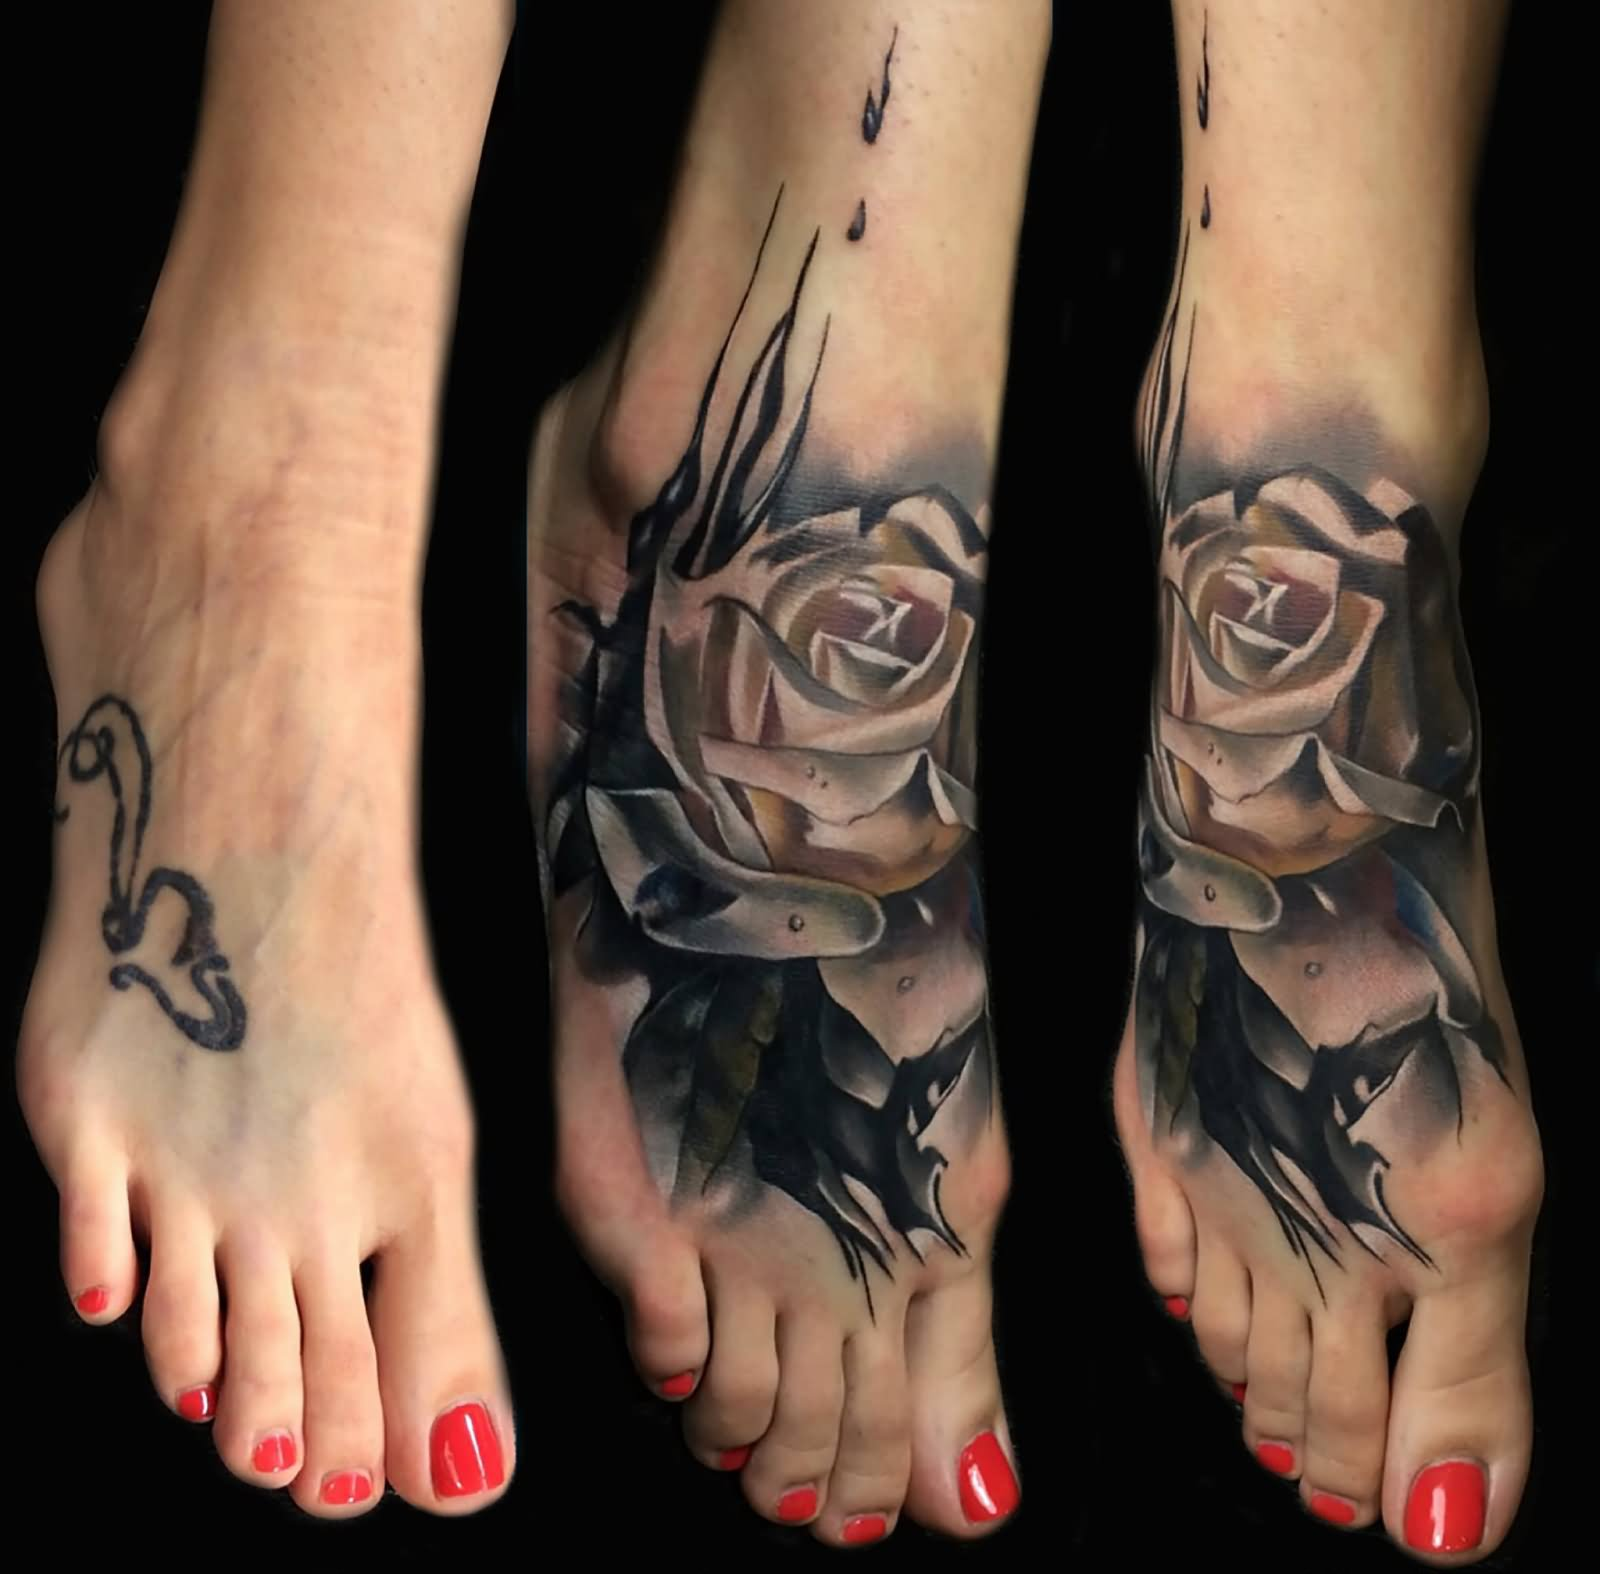 b62281edeb34d Awesome 3D Black Rose Foot Tattoo By Sebastian Nowacki